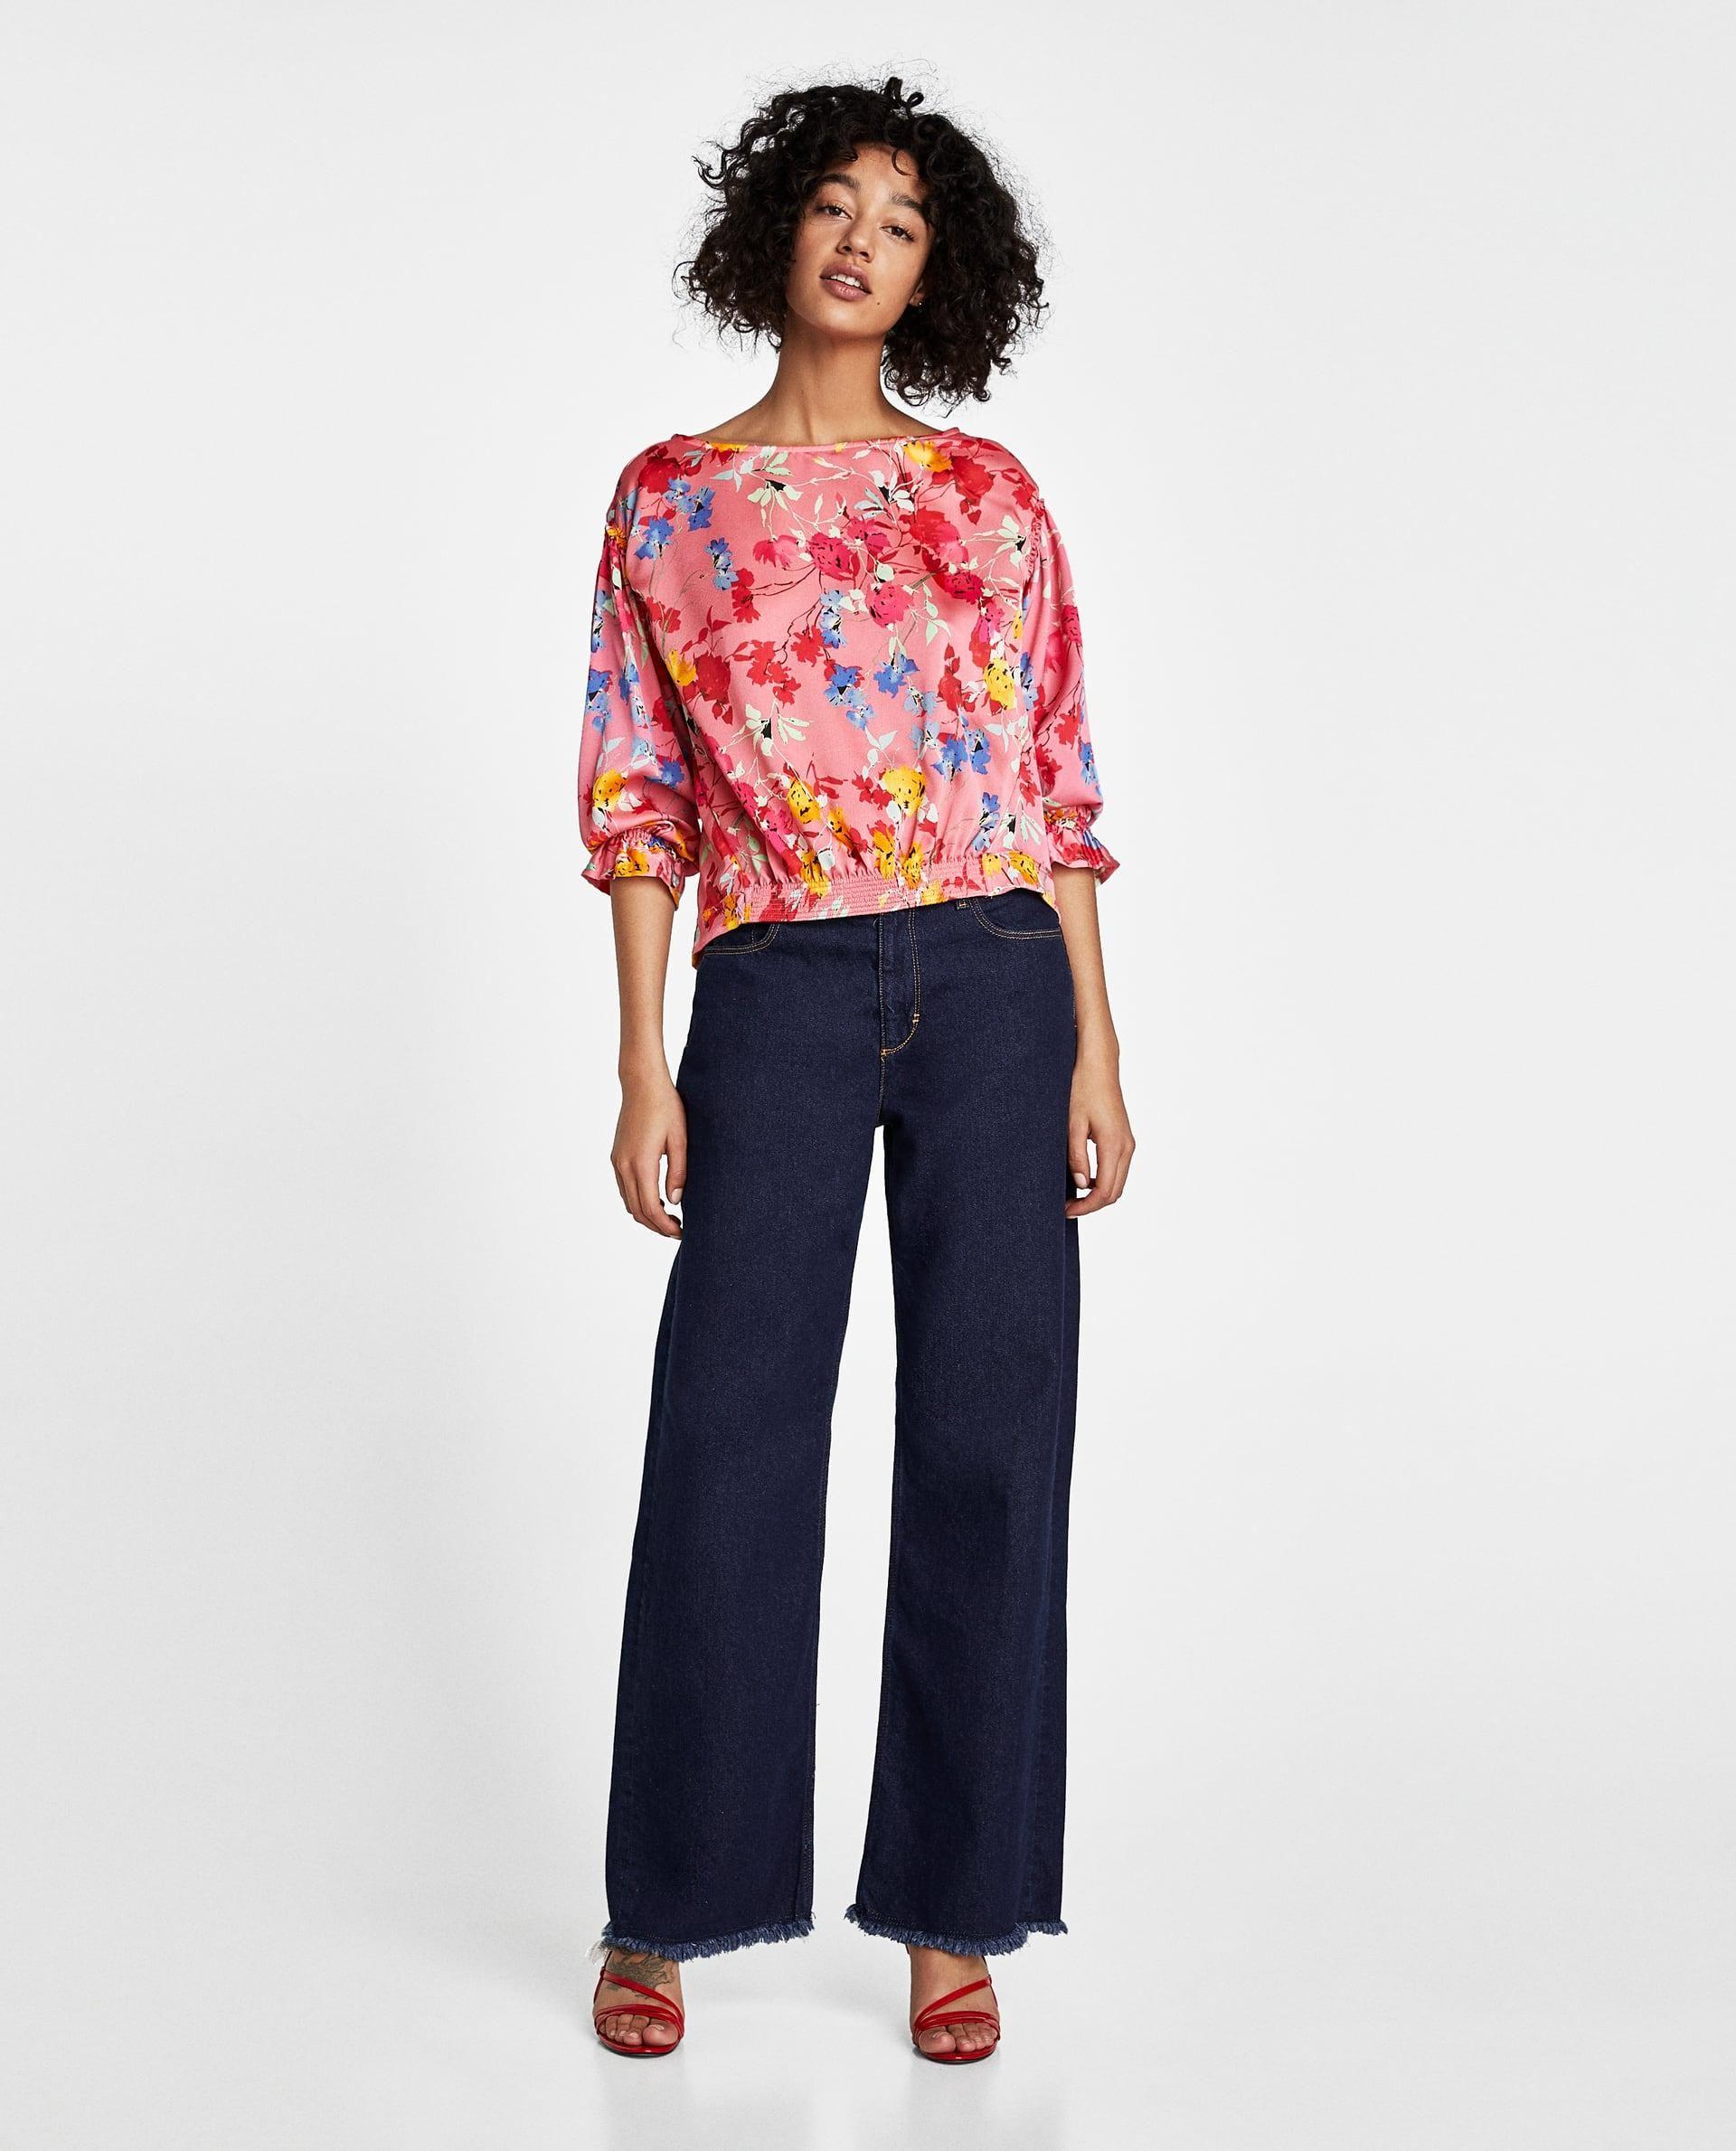 5f439f175ca Zara Flowing Floral Print Blouse